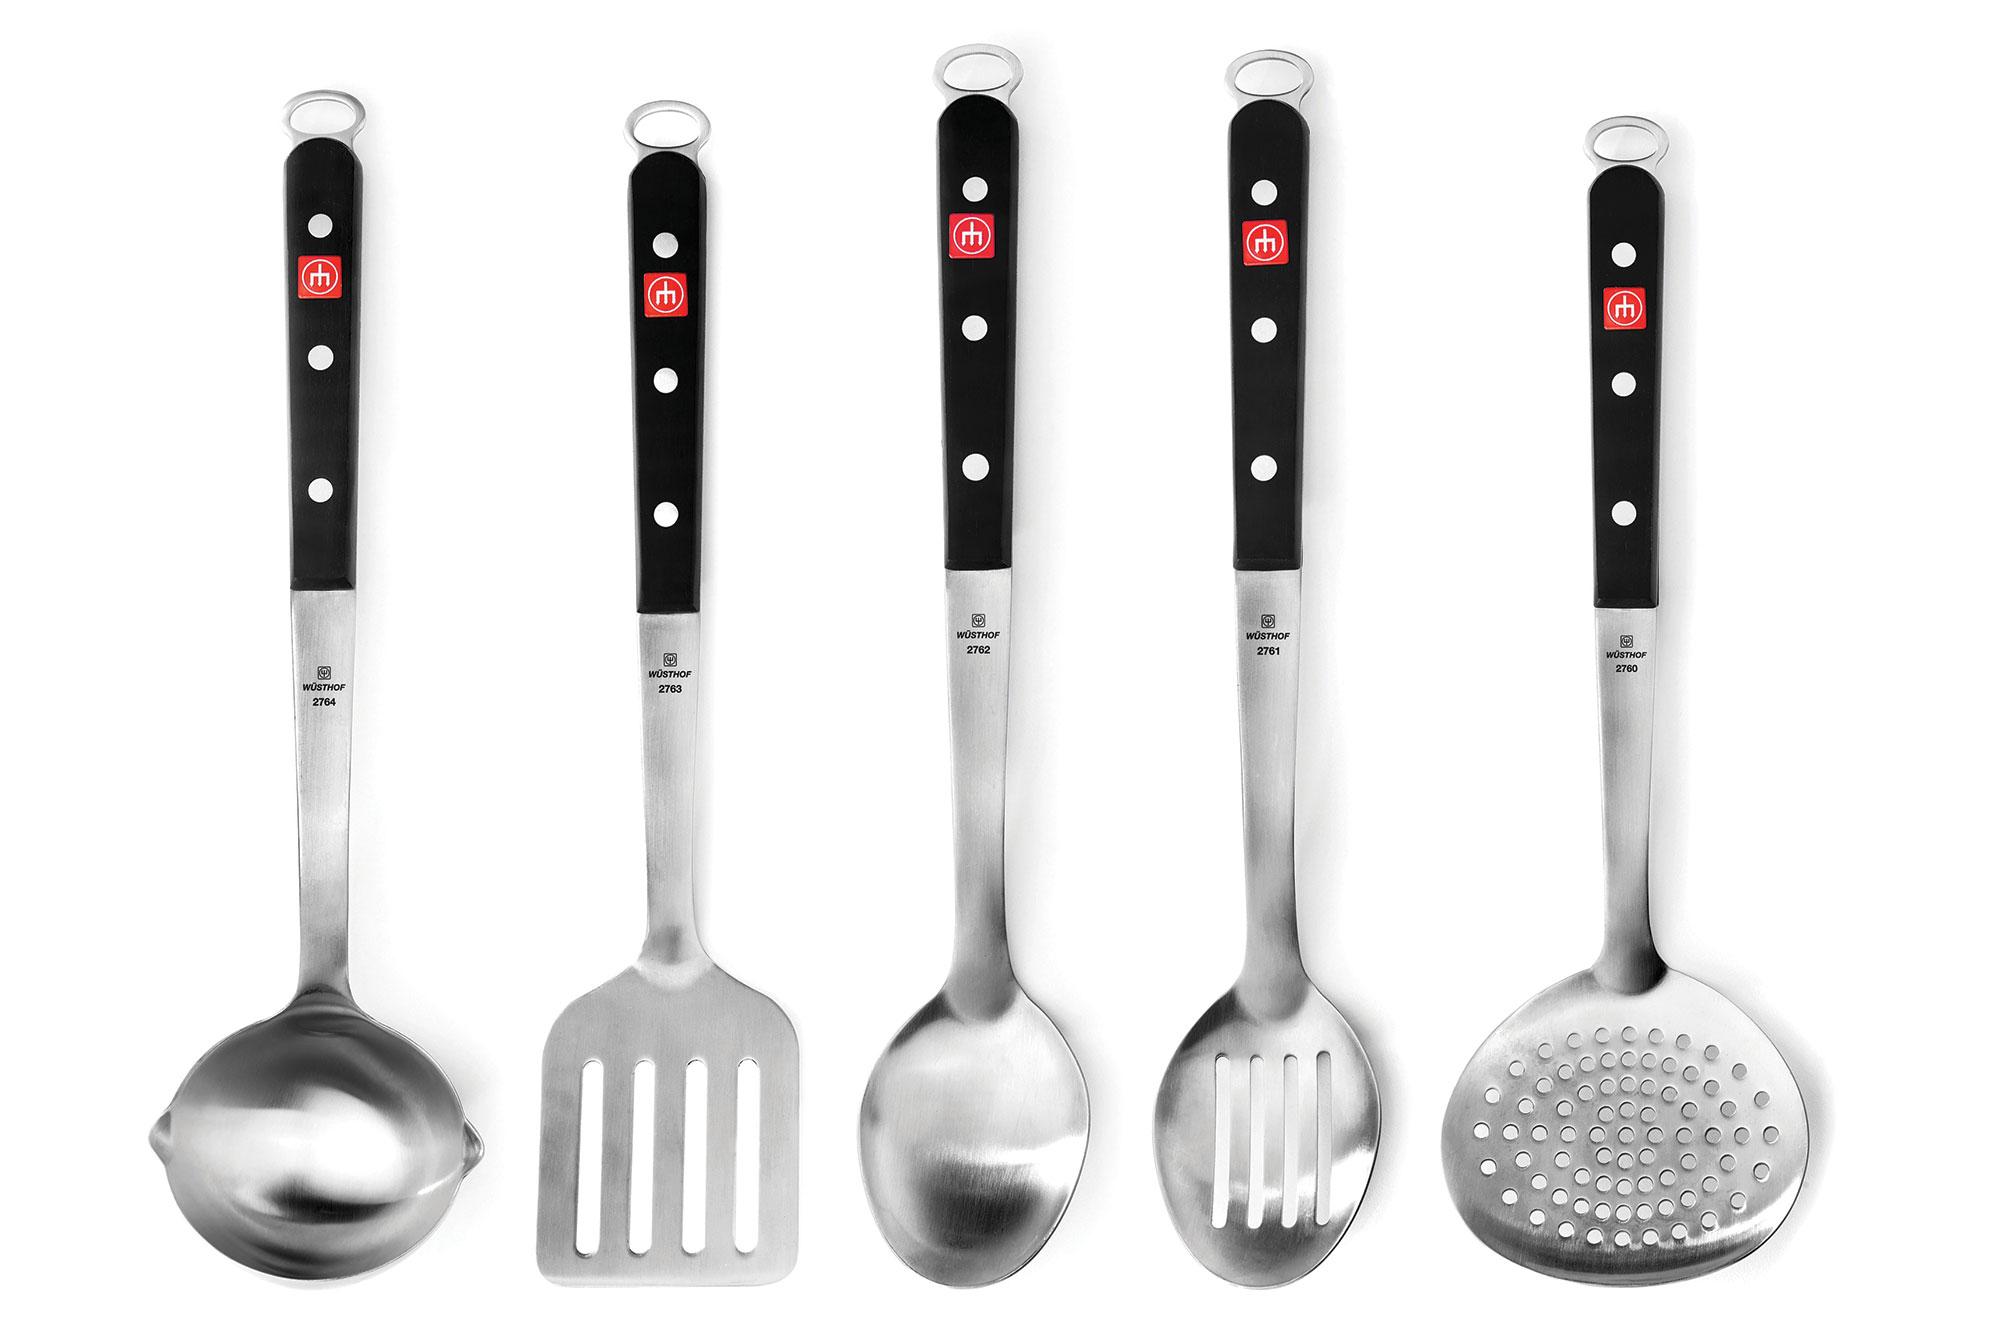 Wusthof Kitchen Utensil Set 5-piece - Tools & Cooking Utensils ...